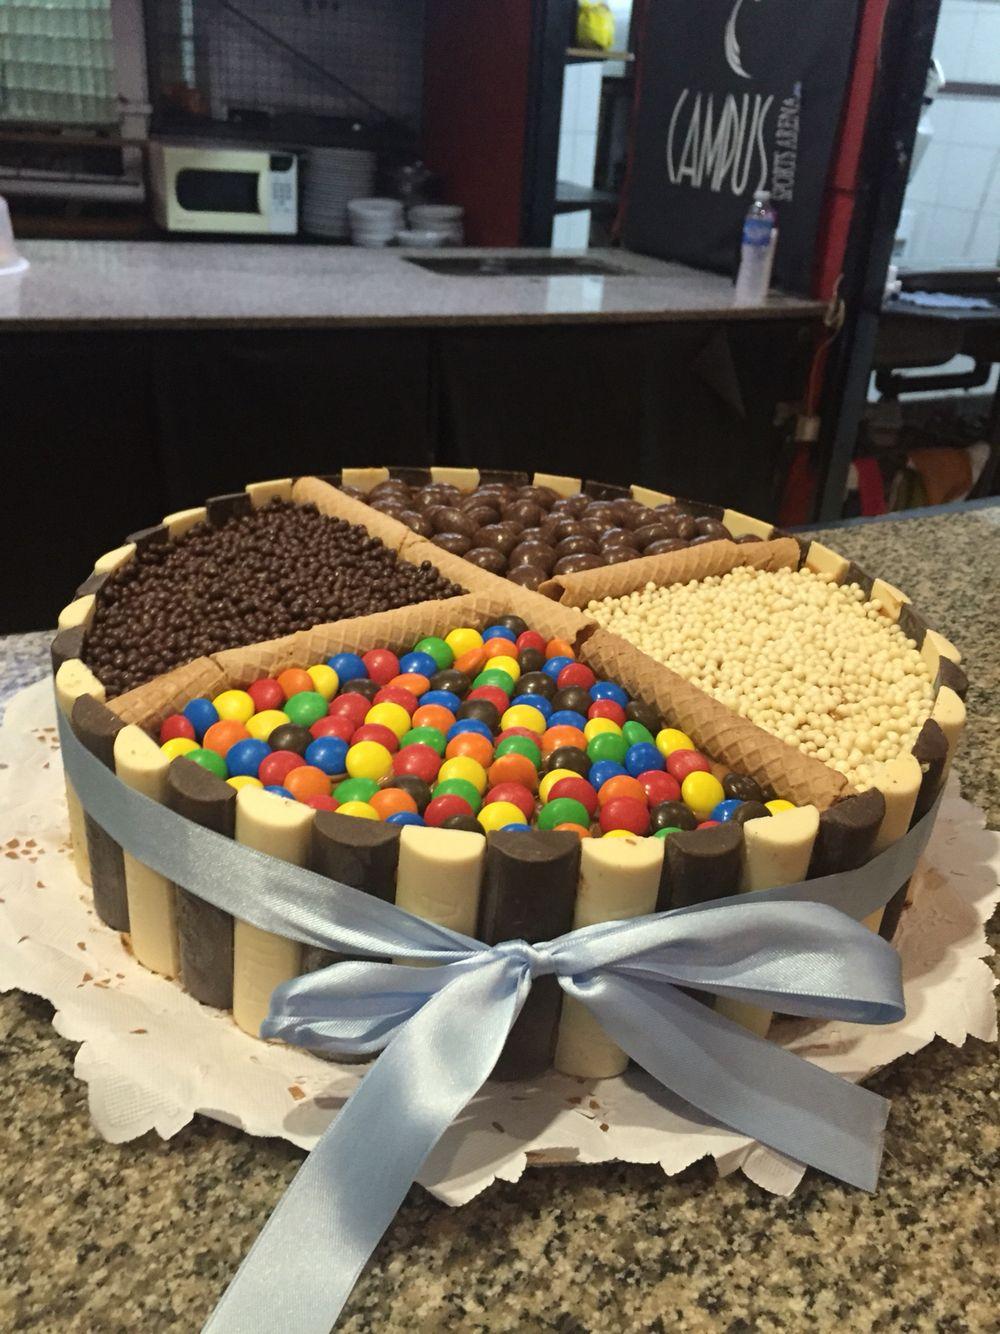 Torta Cumple 11 Años Santi Comida Para Fiesta Decoración De Fiestas Infantiles Fiestas Infantiles